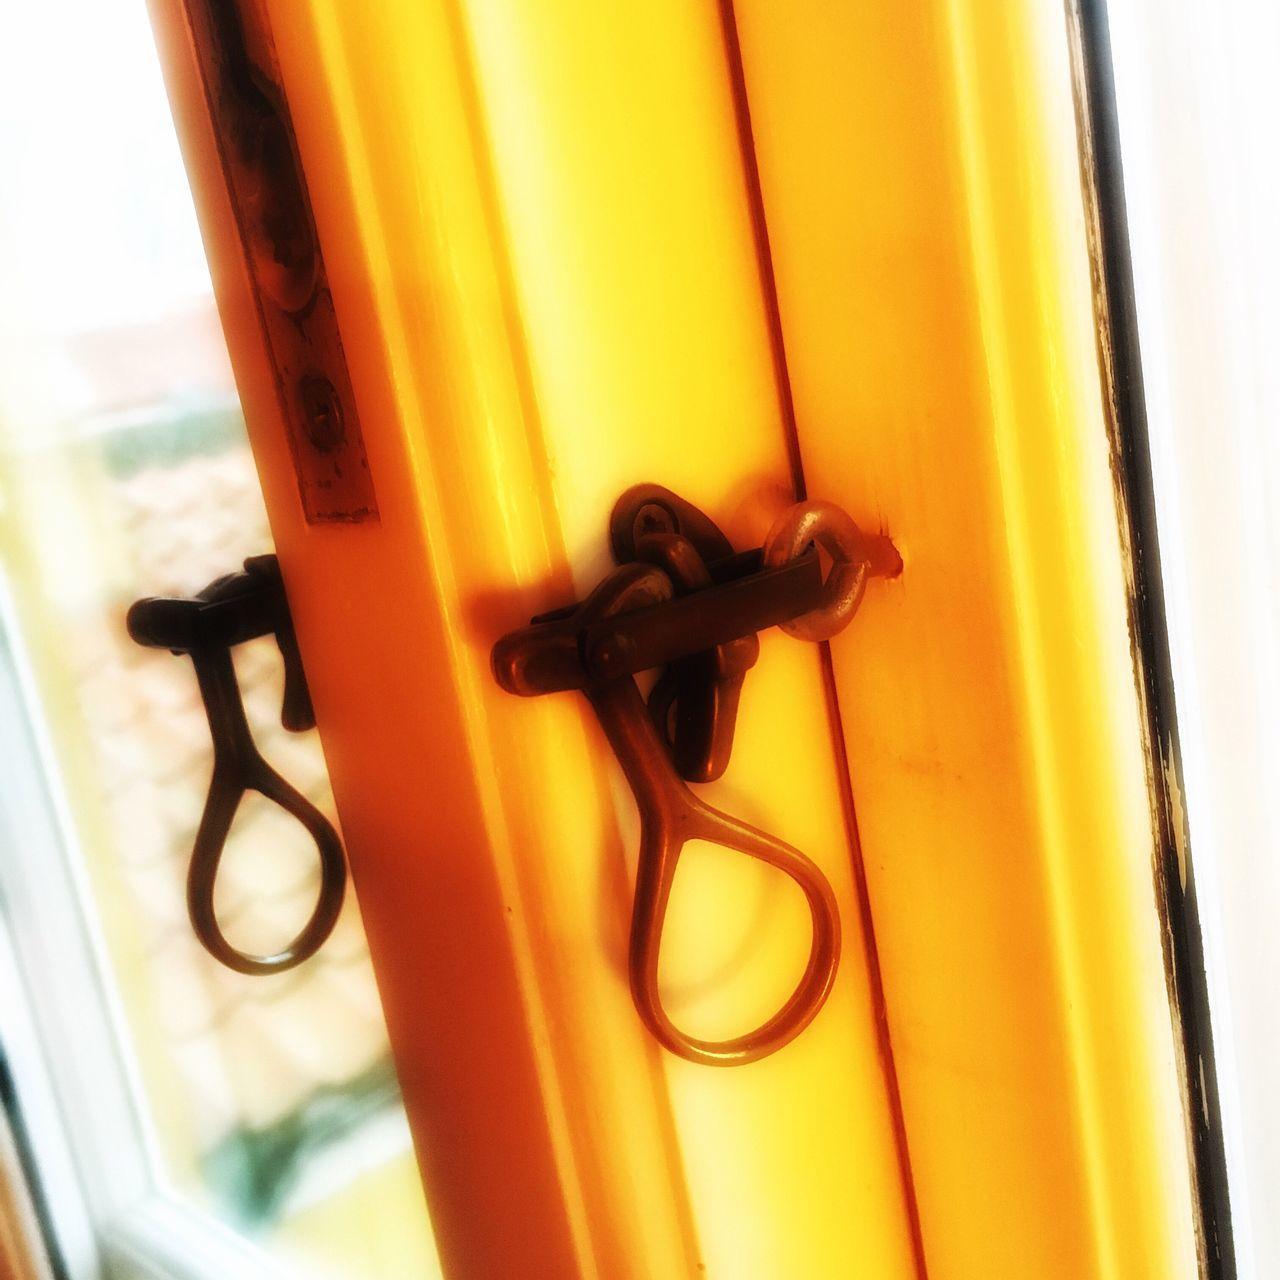 Ribe Denmark Close-up Indoors  Yellow Window Architecture Scandinavia